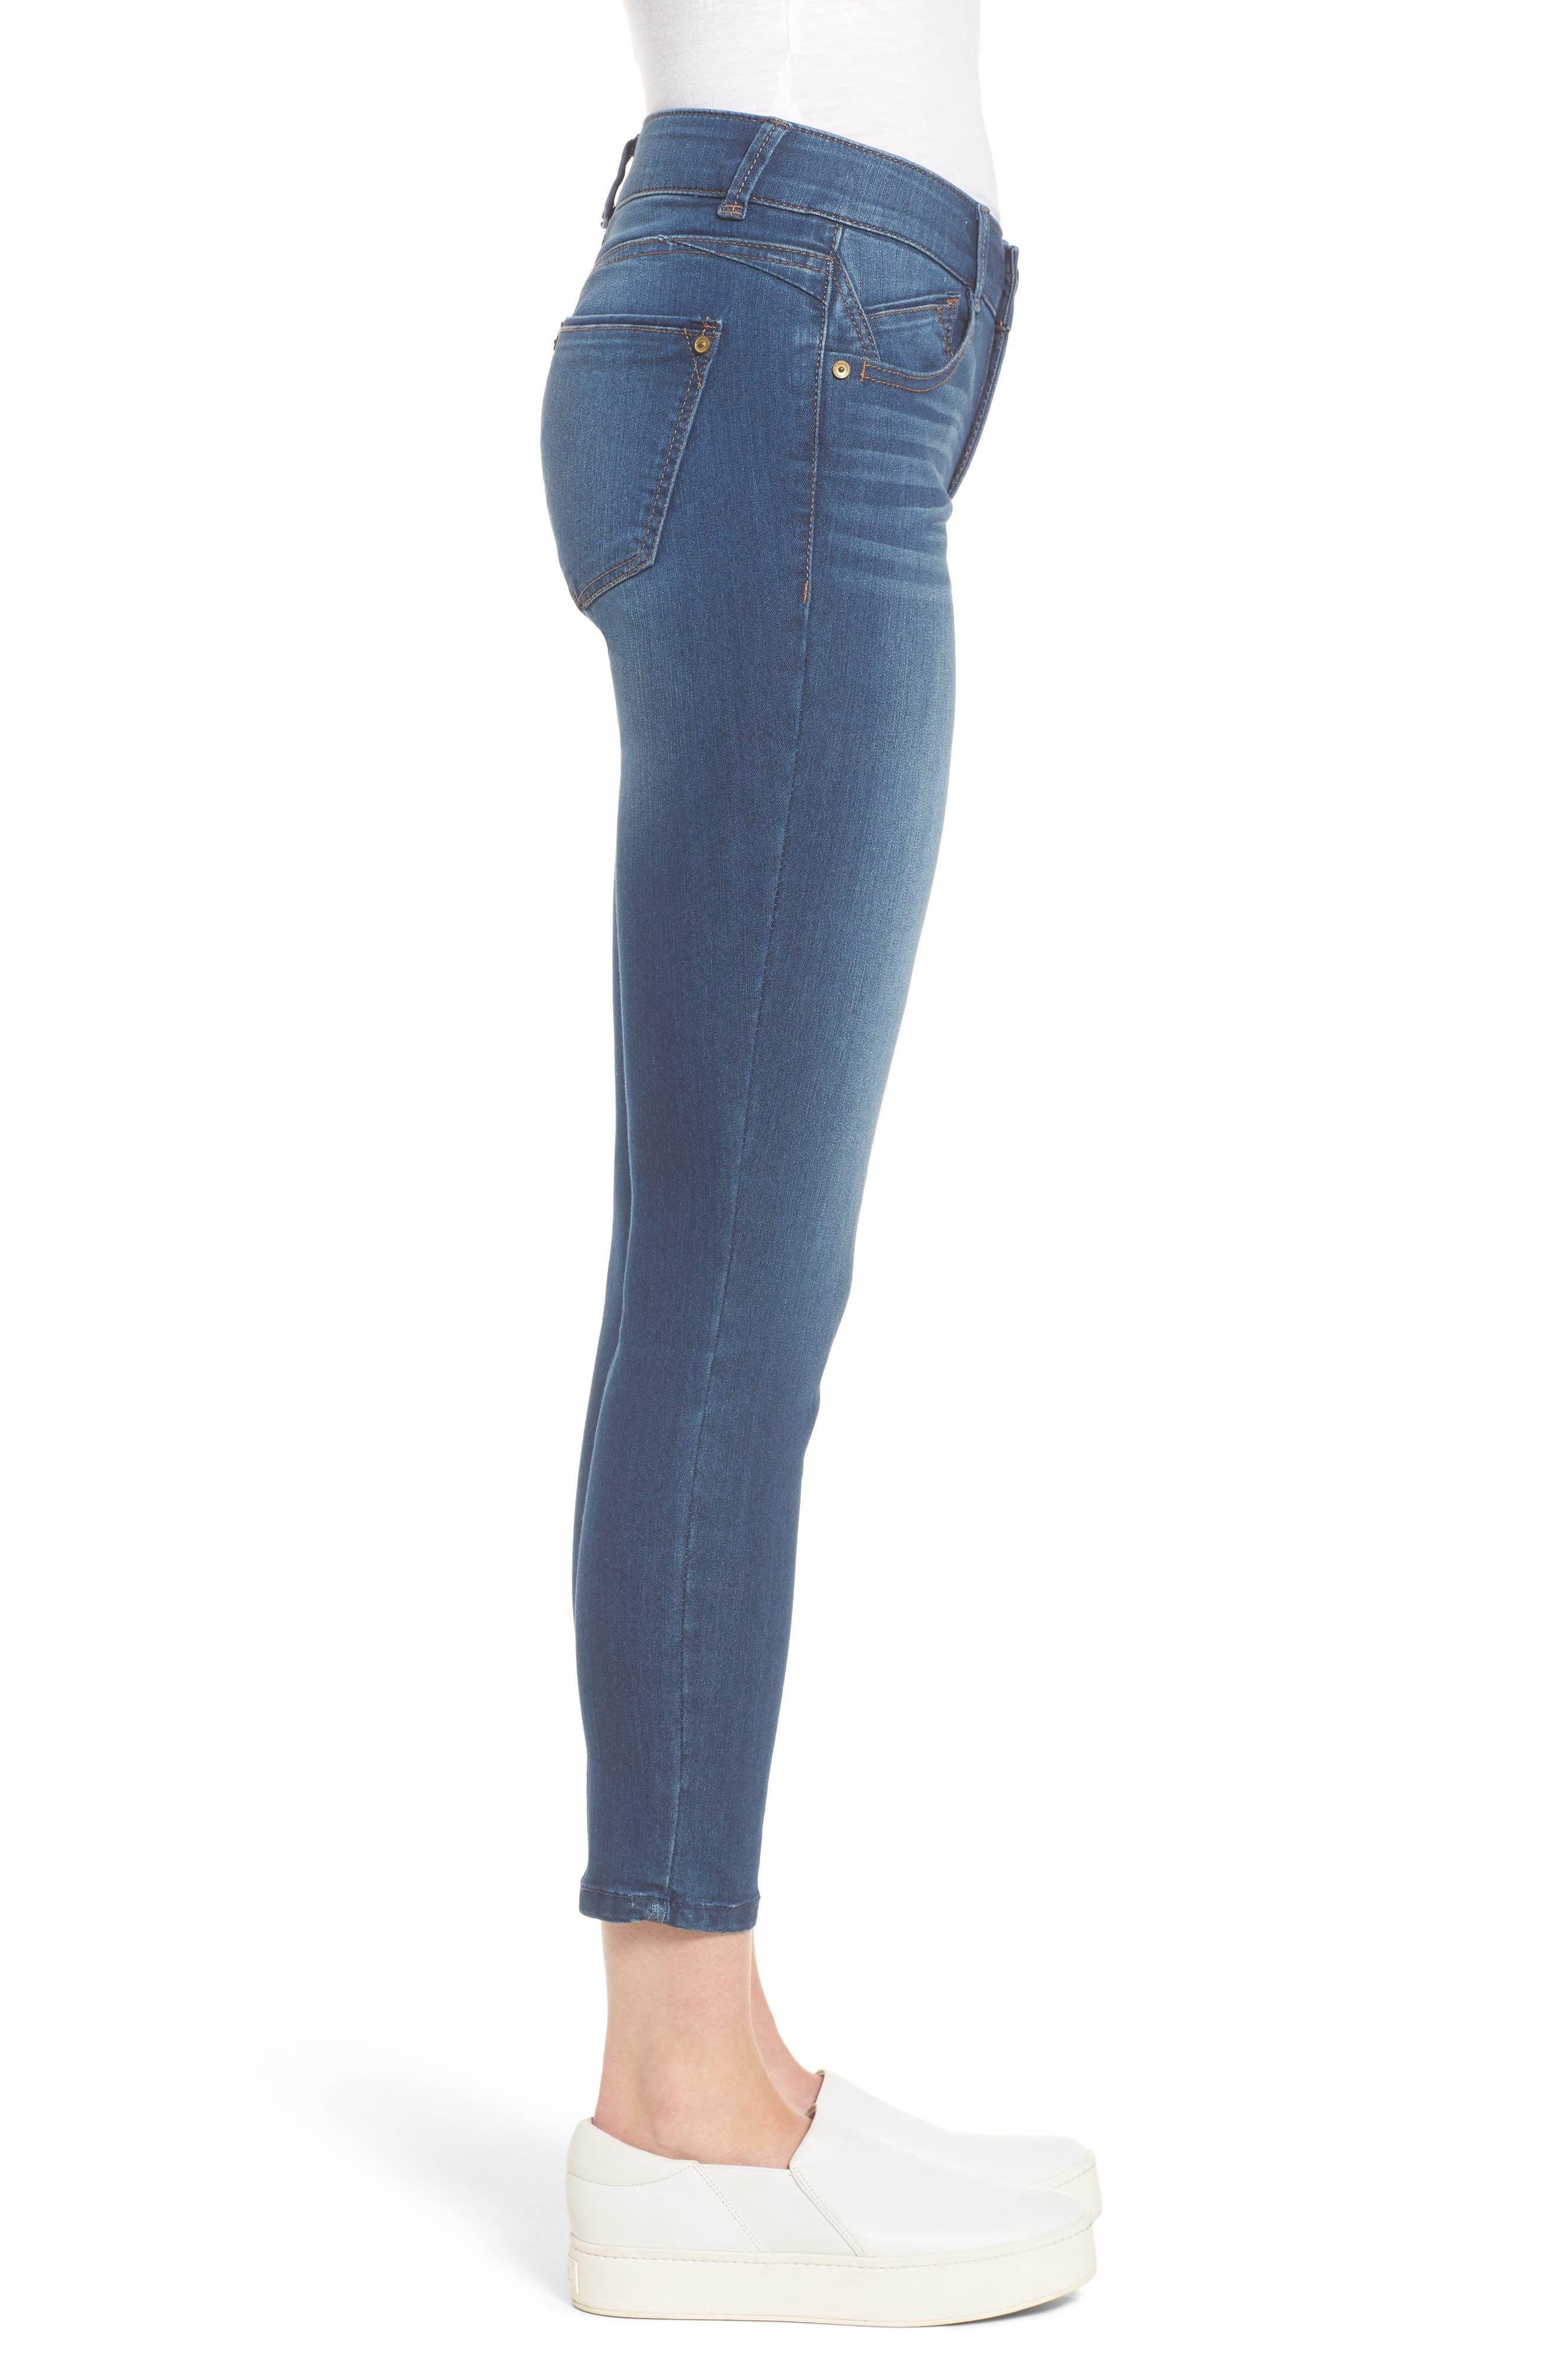 Alternate Image 3  - Wit & Wisdom Ab-solution Ankle Skimmer Jeans (Nordstrom Exclusive)